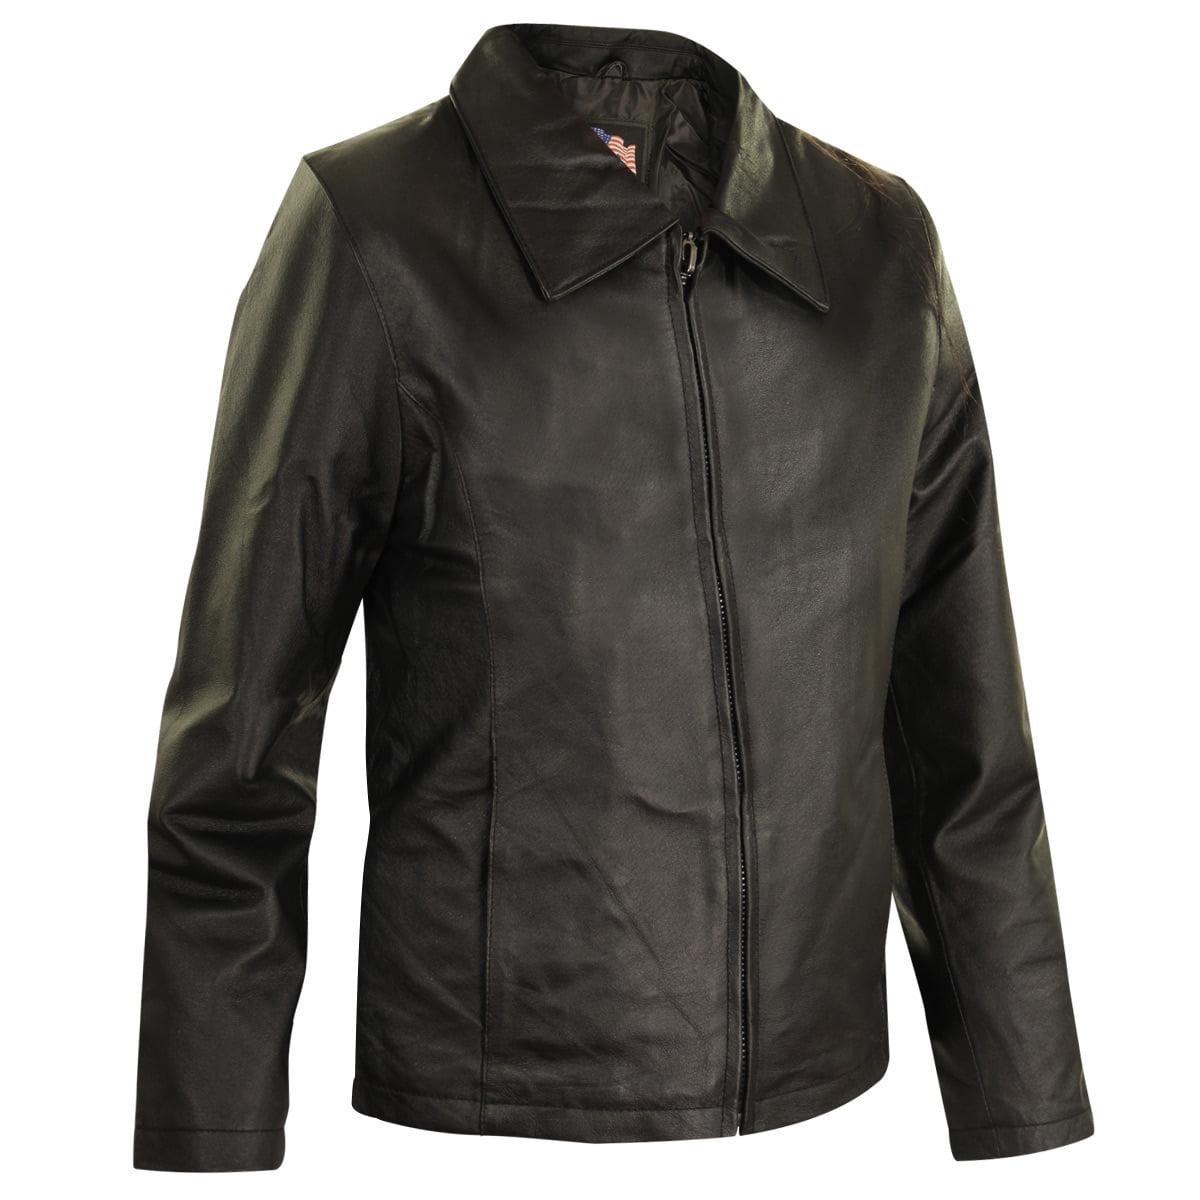 USA Leather Womens Black Leather Jacket